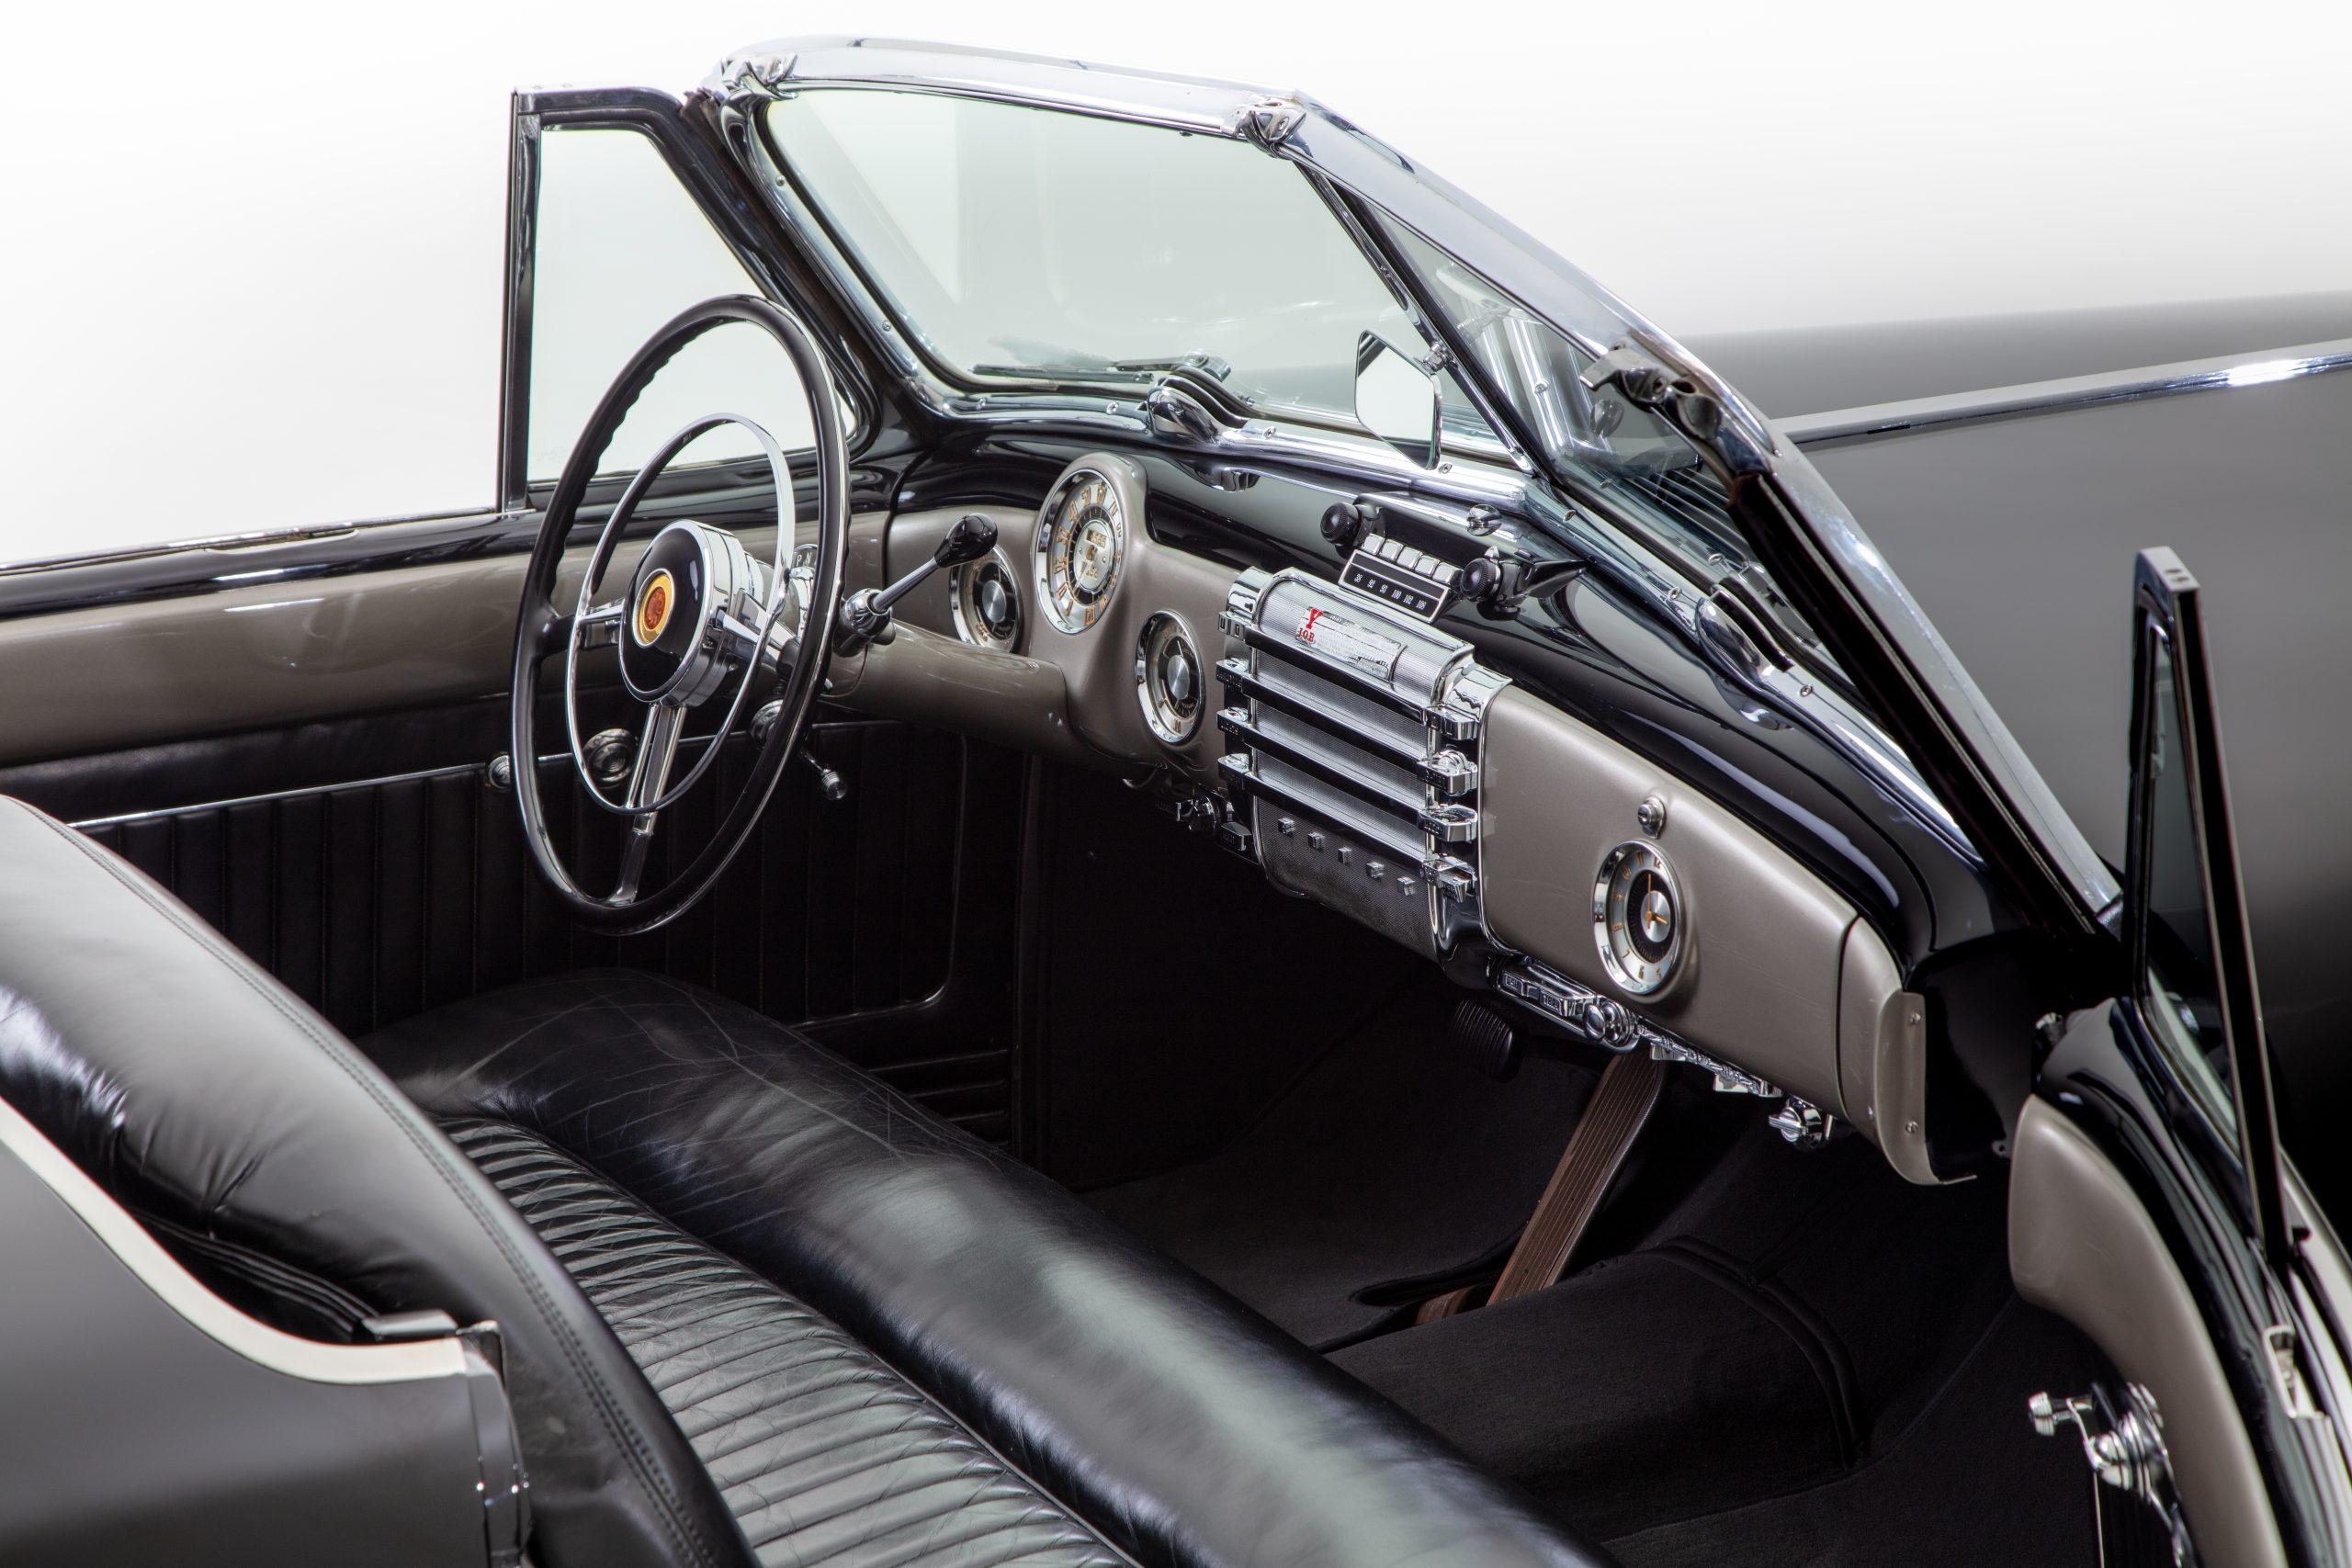 Buick Y-Job Interior Front Angle